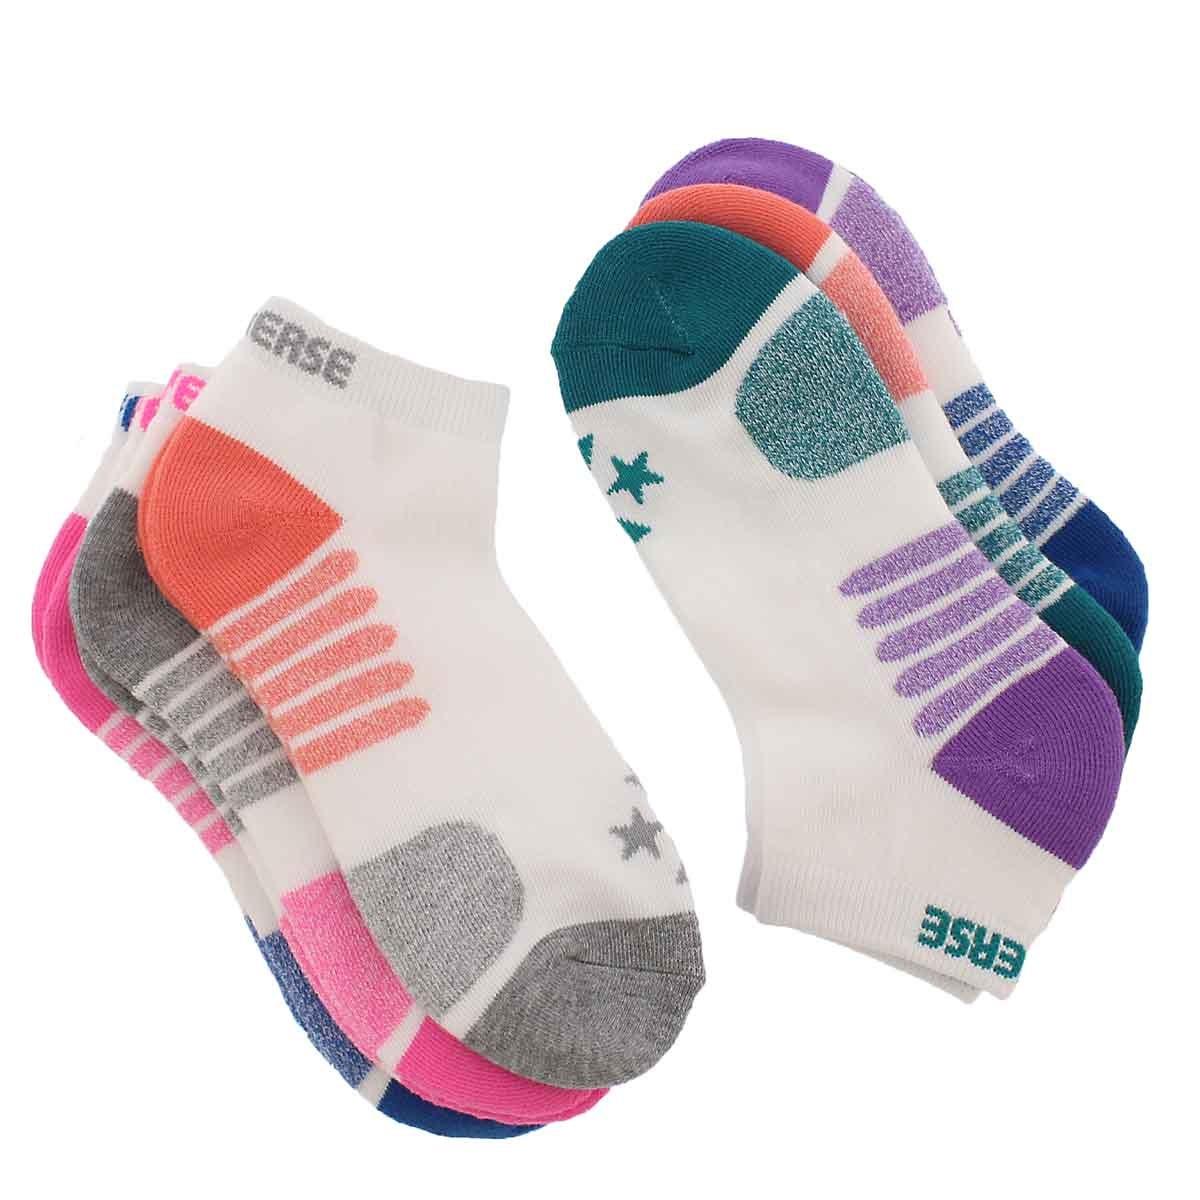 Lds Converse wht/mlt low cut sock 6pk